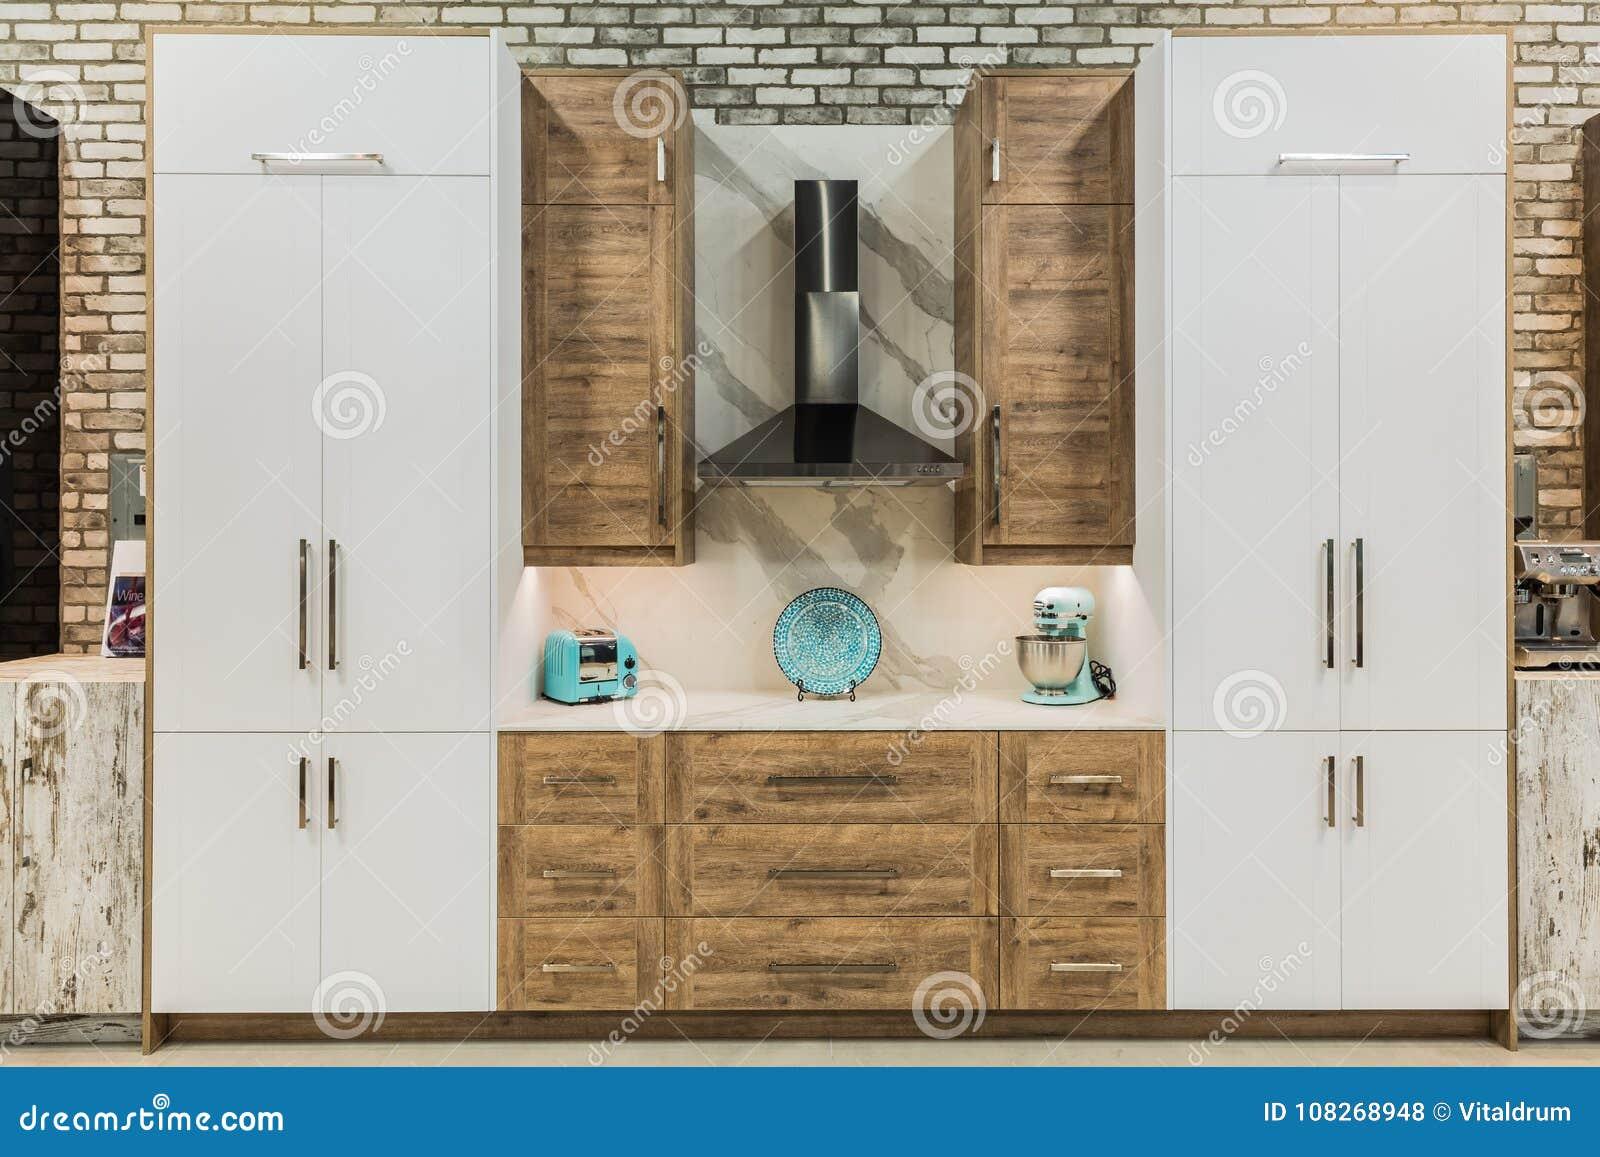 Modern Interieur Warm : Amazing warm view of stylish modern interior decorative natural